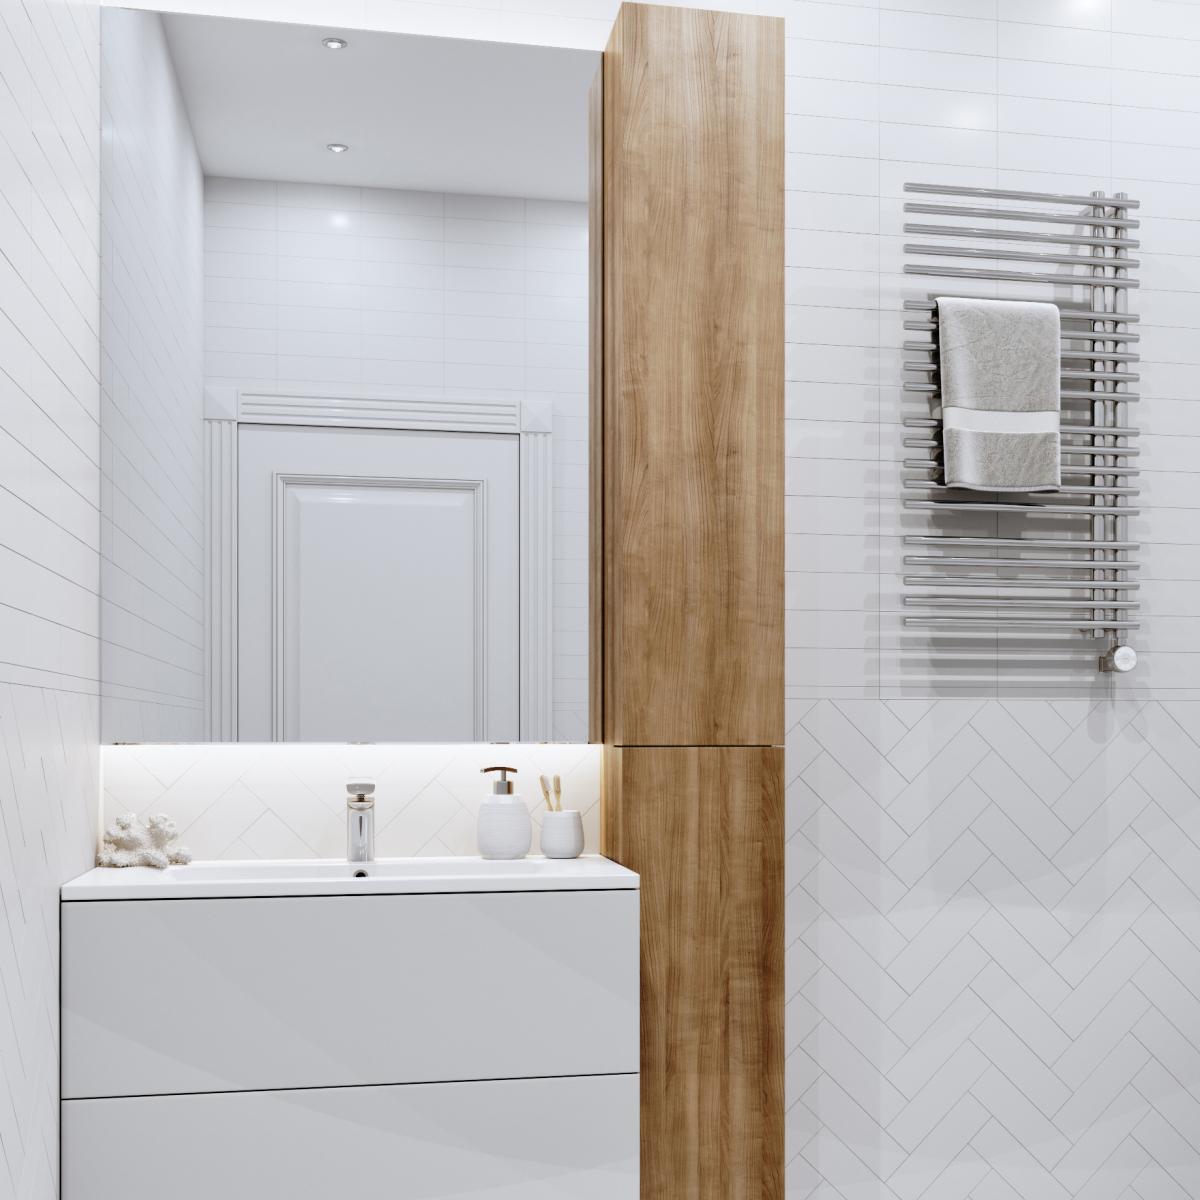 Плитка настенная Матео 7.5x25 см 0.79 м2 цвет белый